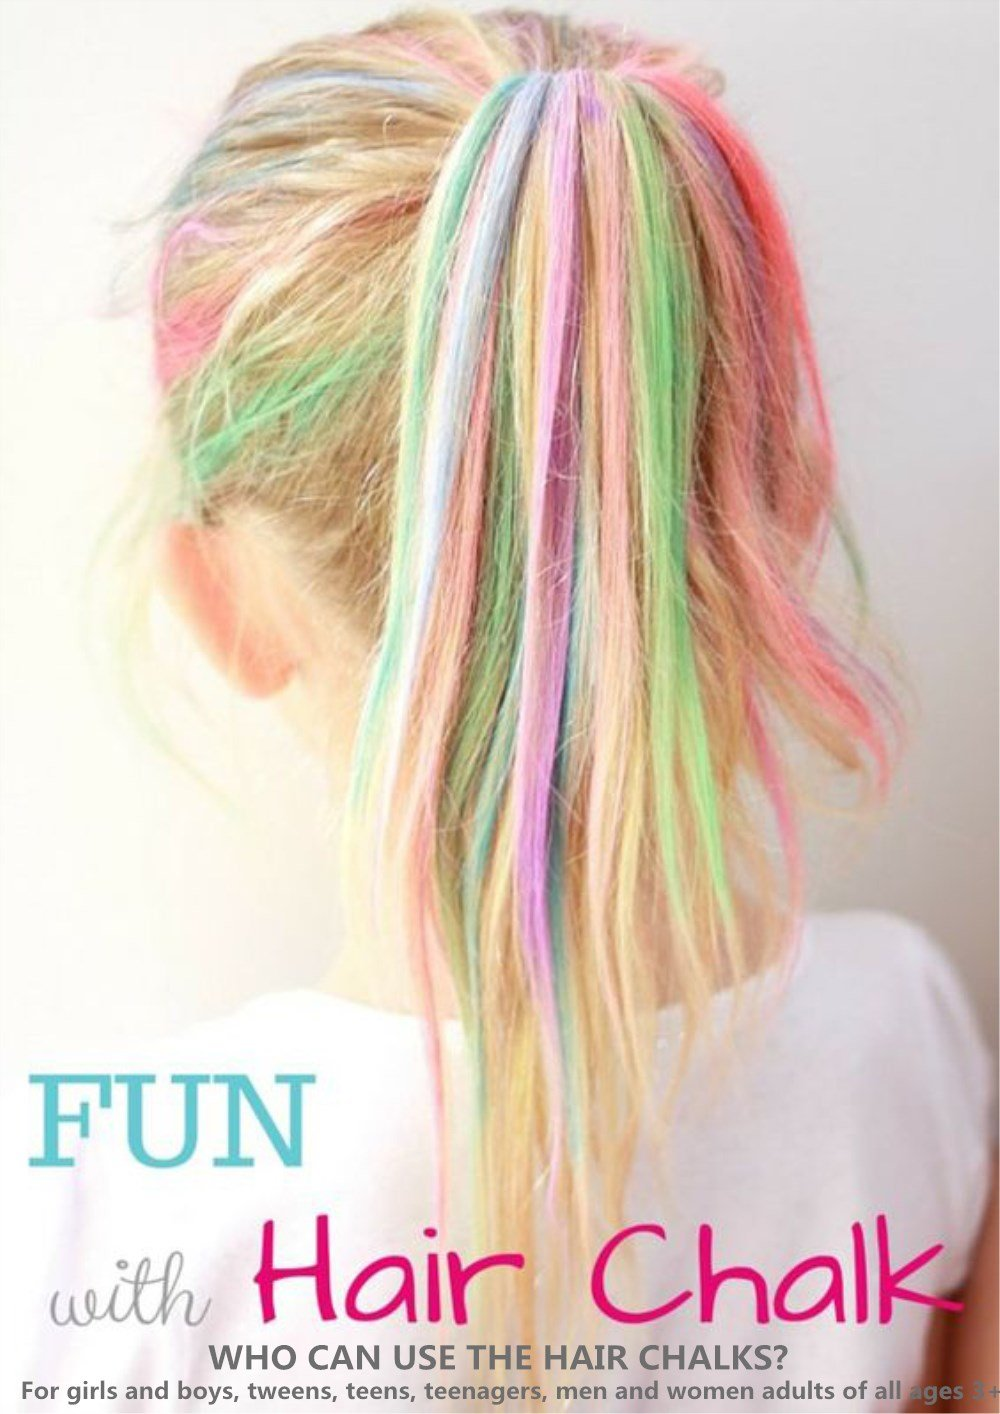 Anngrowy Hair Chalk For Girls Kids Birthday Gifts For Girls Kids